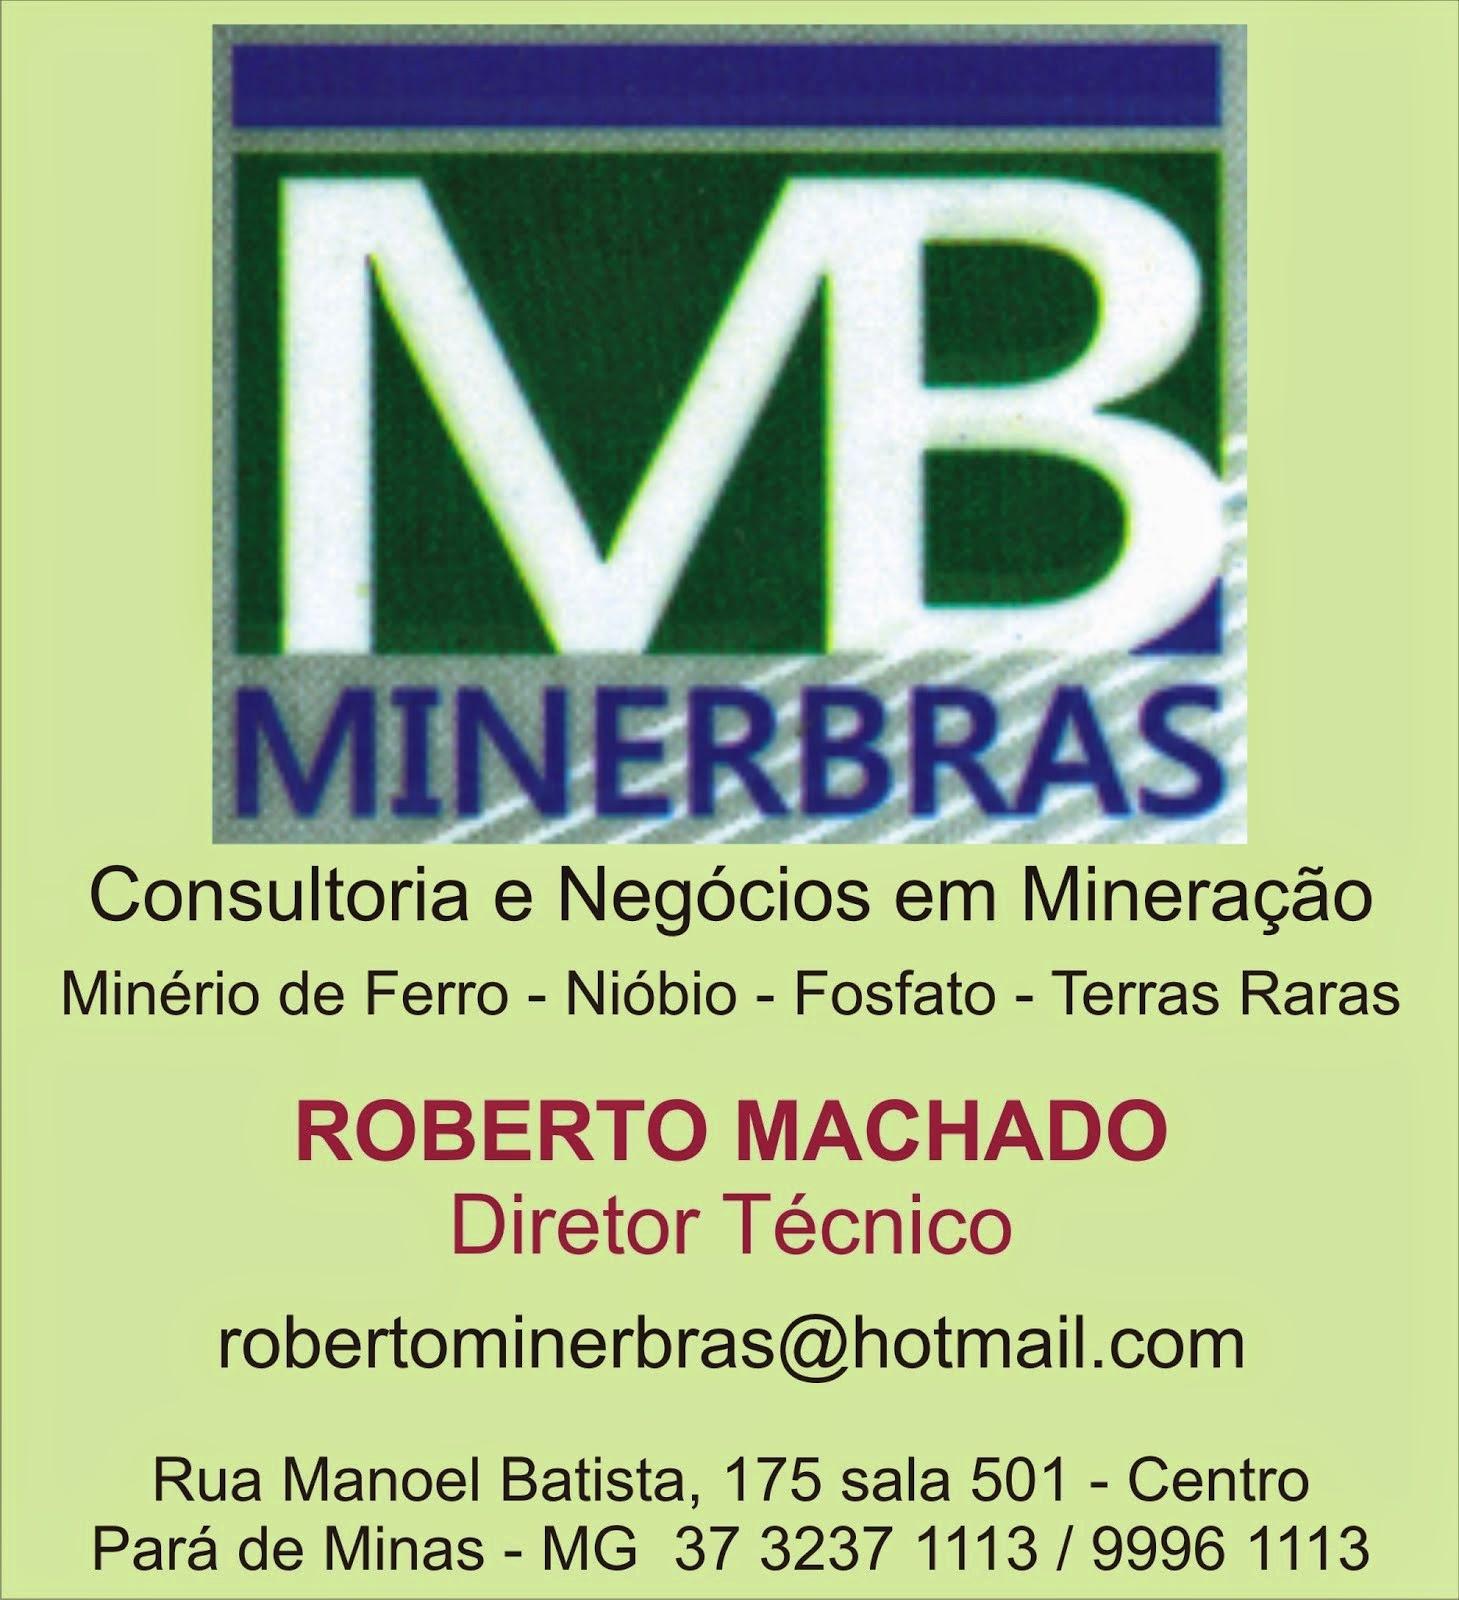 MINERBRAS MINERAÇÕES BRASILEIRAS LTDA